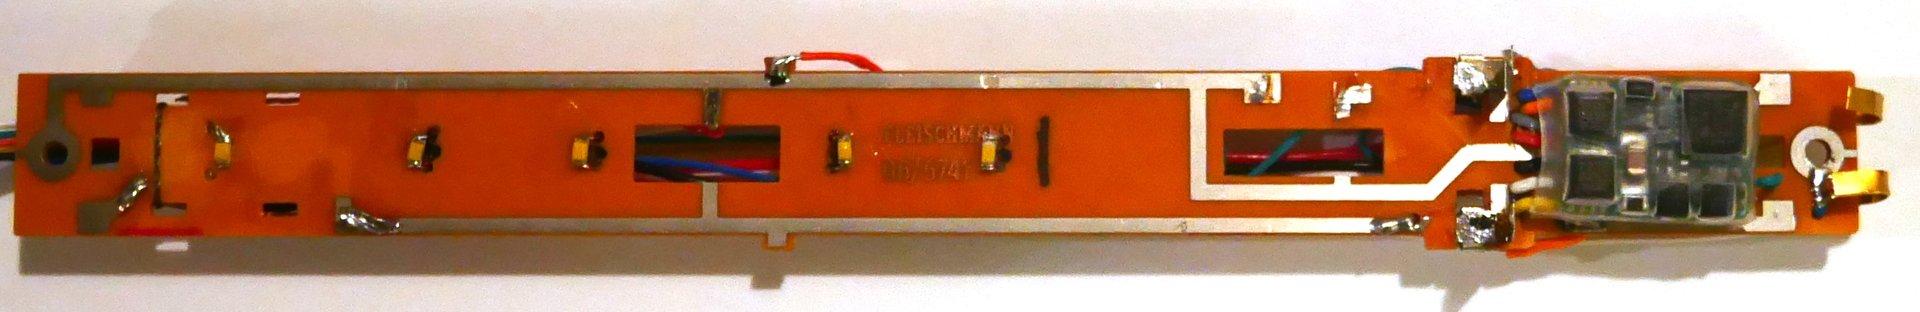 P1140763.JPG